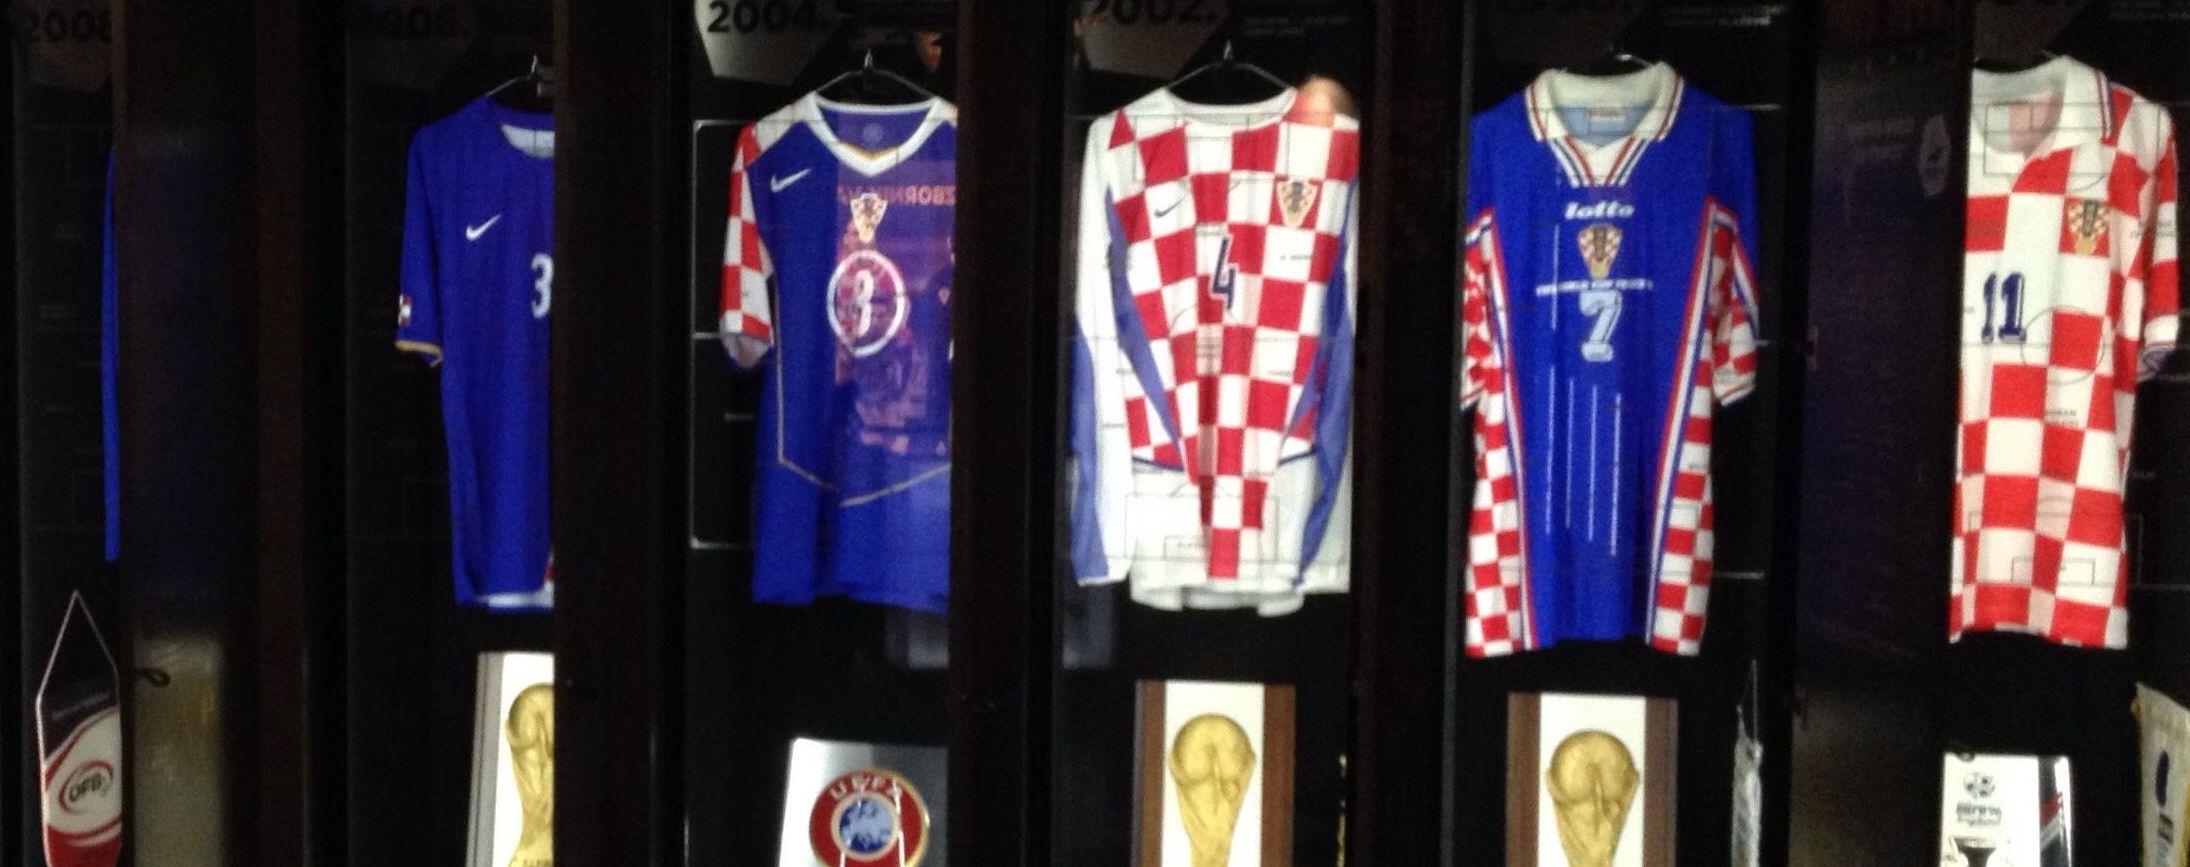 [PHOTOS] Photo Tour of the Croatian Football 'Museum'